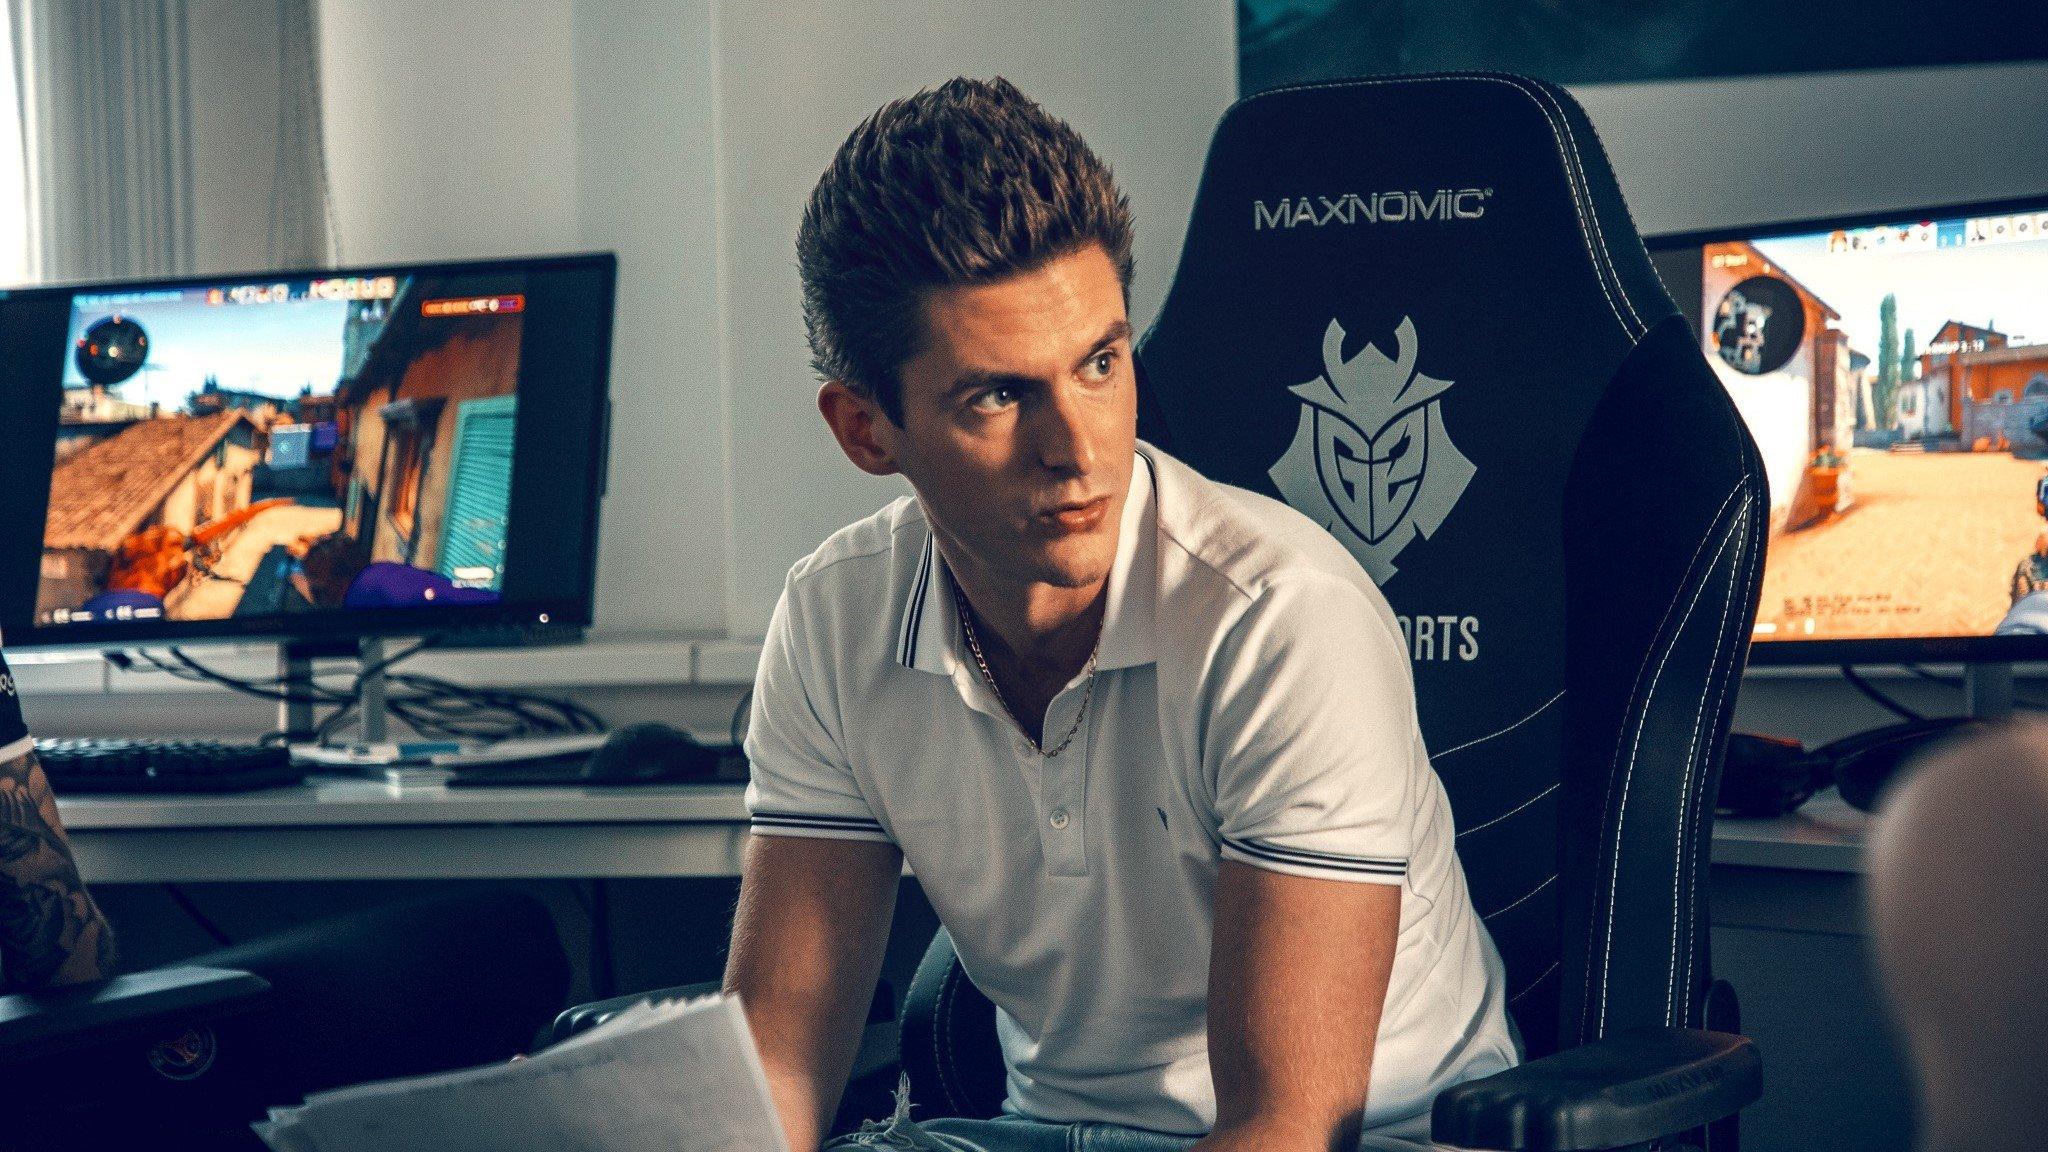 Report: Ex6TenZ set to join NiP Valorant team